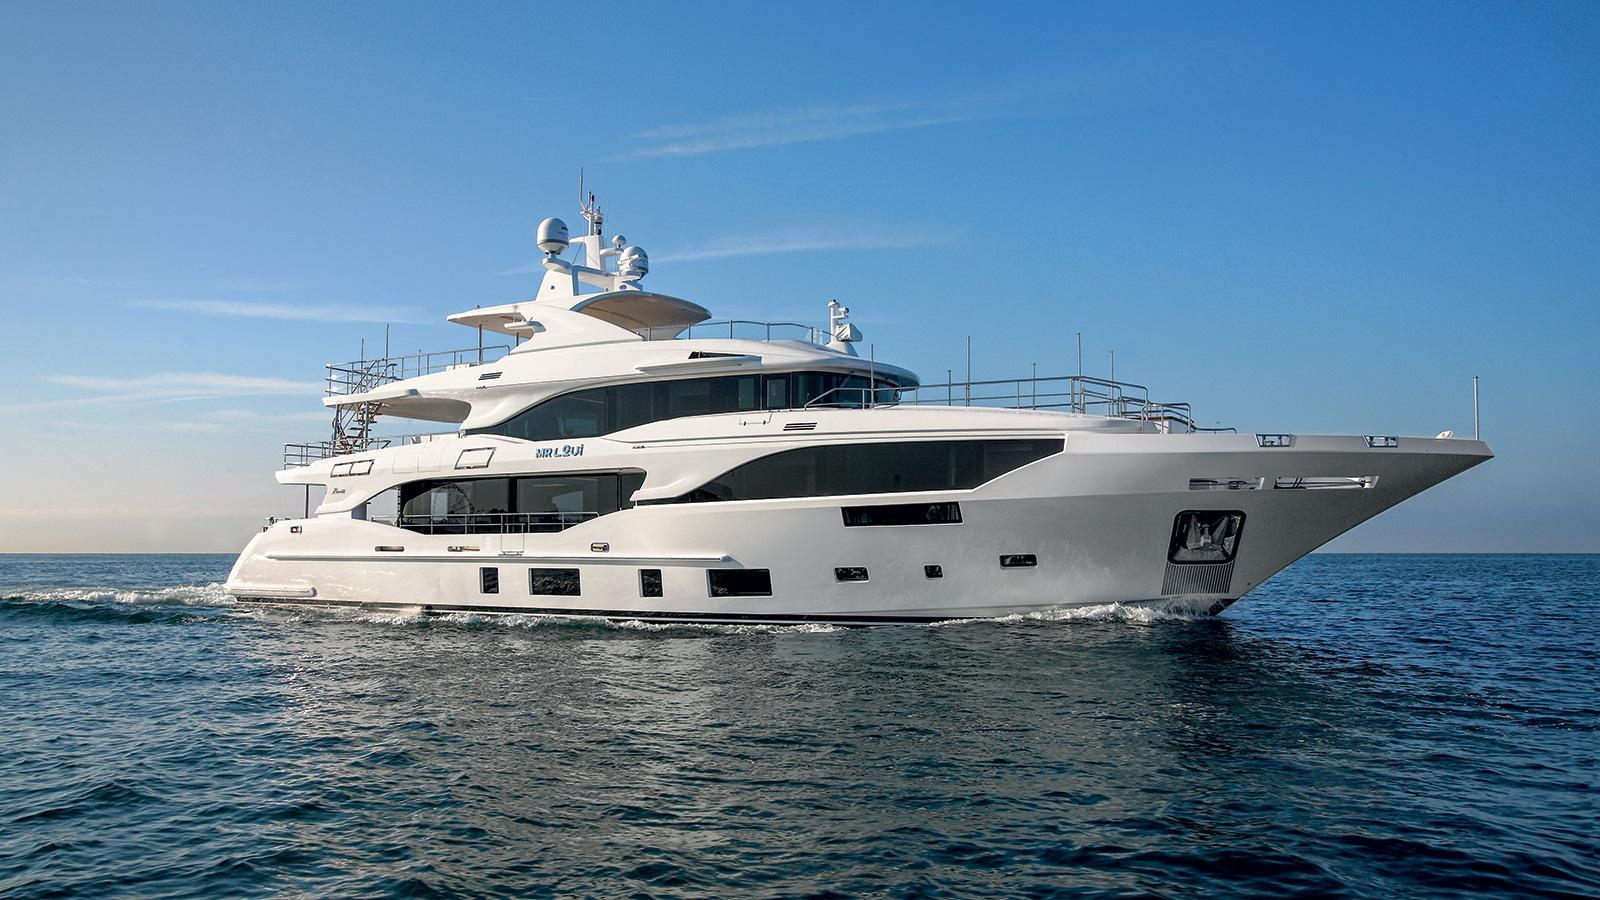 Mediterraneo 116 motoryacht Benetti 35m 2019 side profile sistership